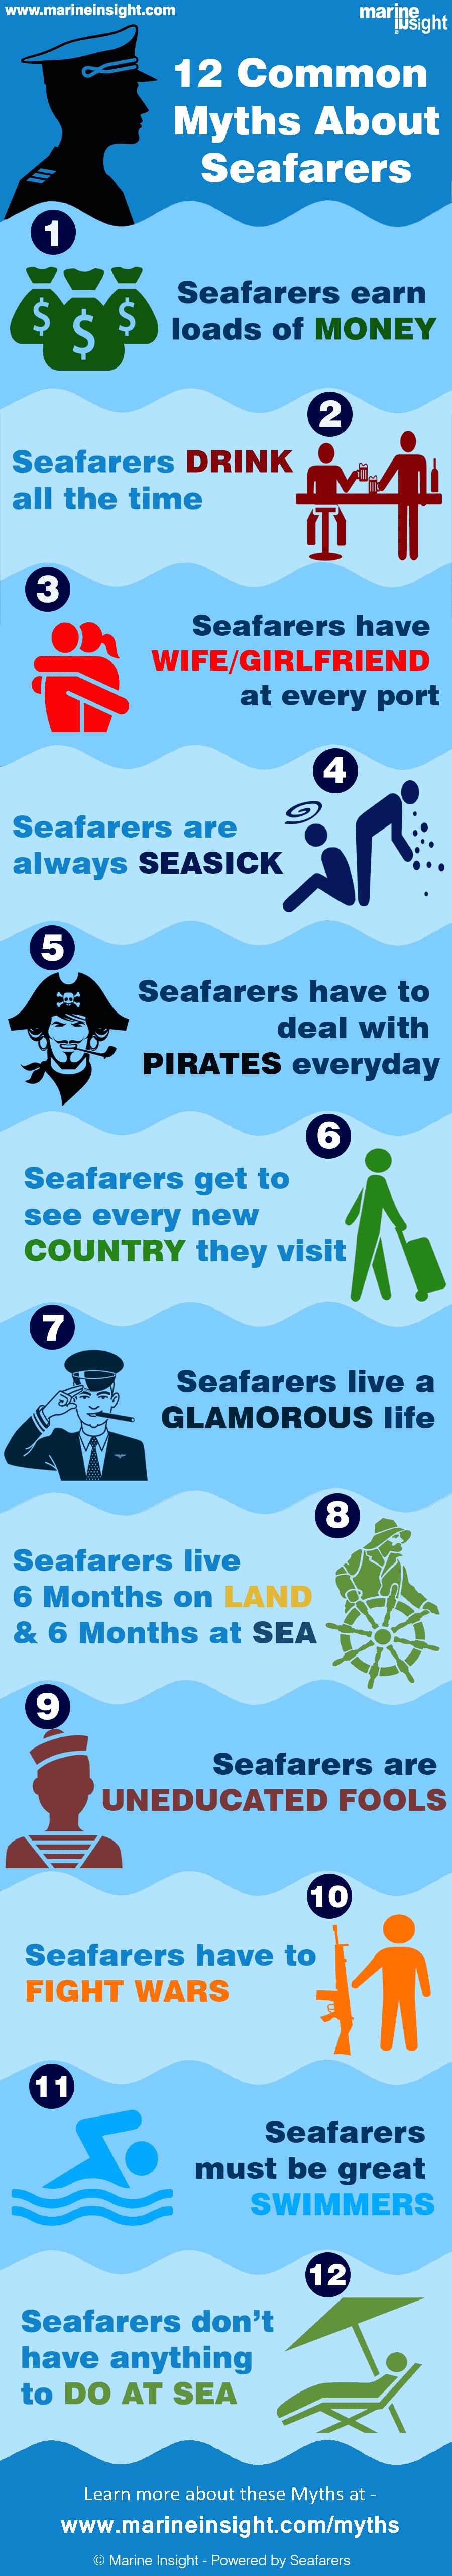 seafarers myth